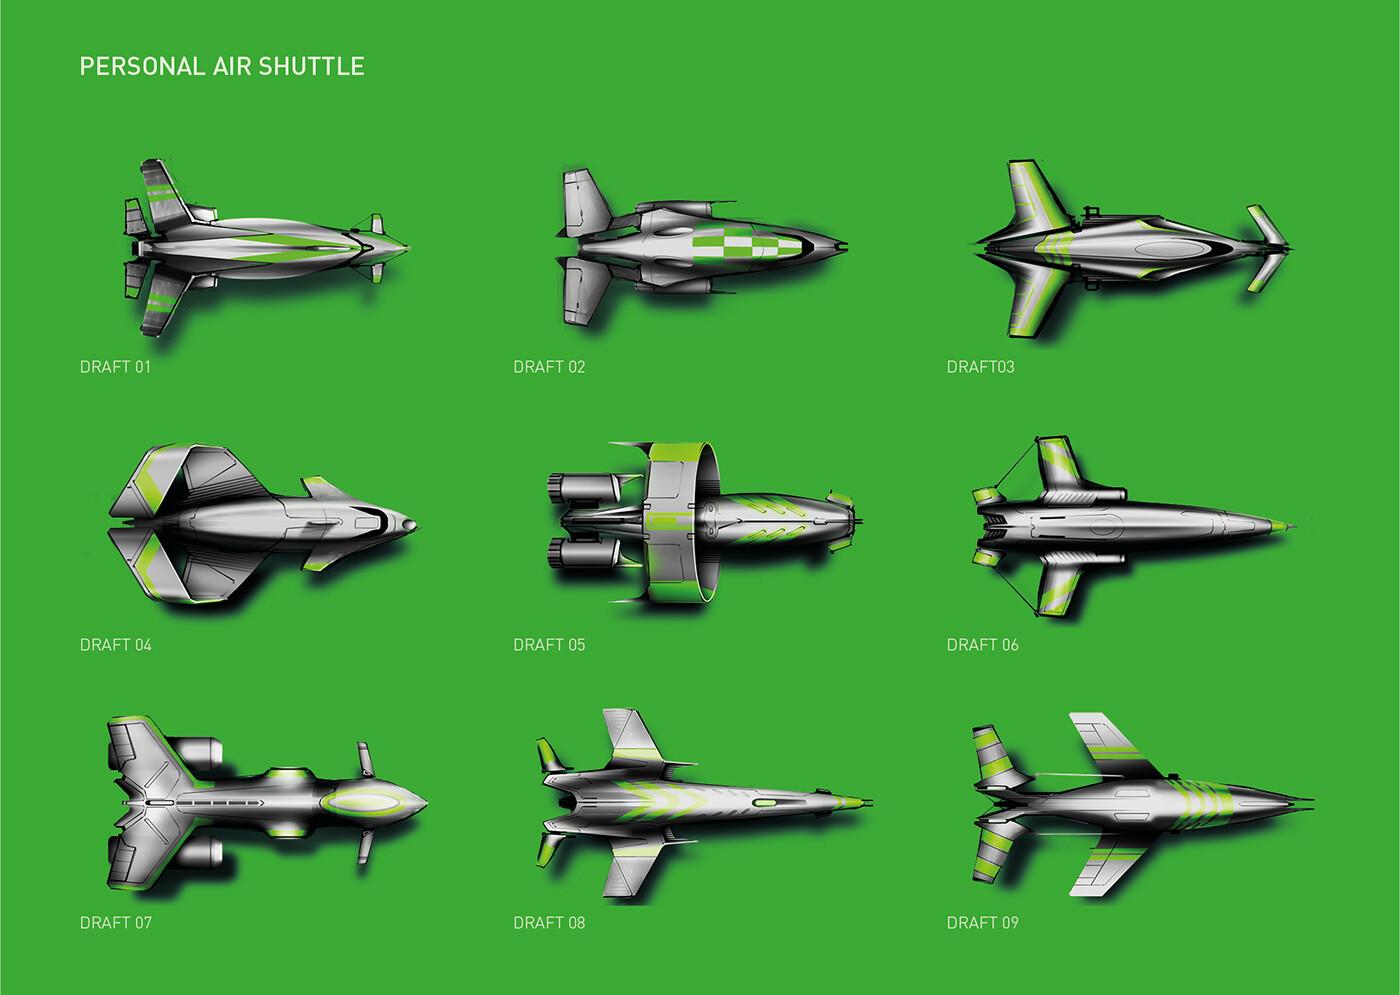 Personal air shuttle - drafts